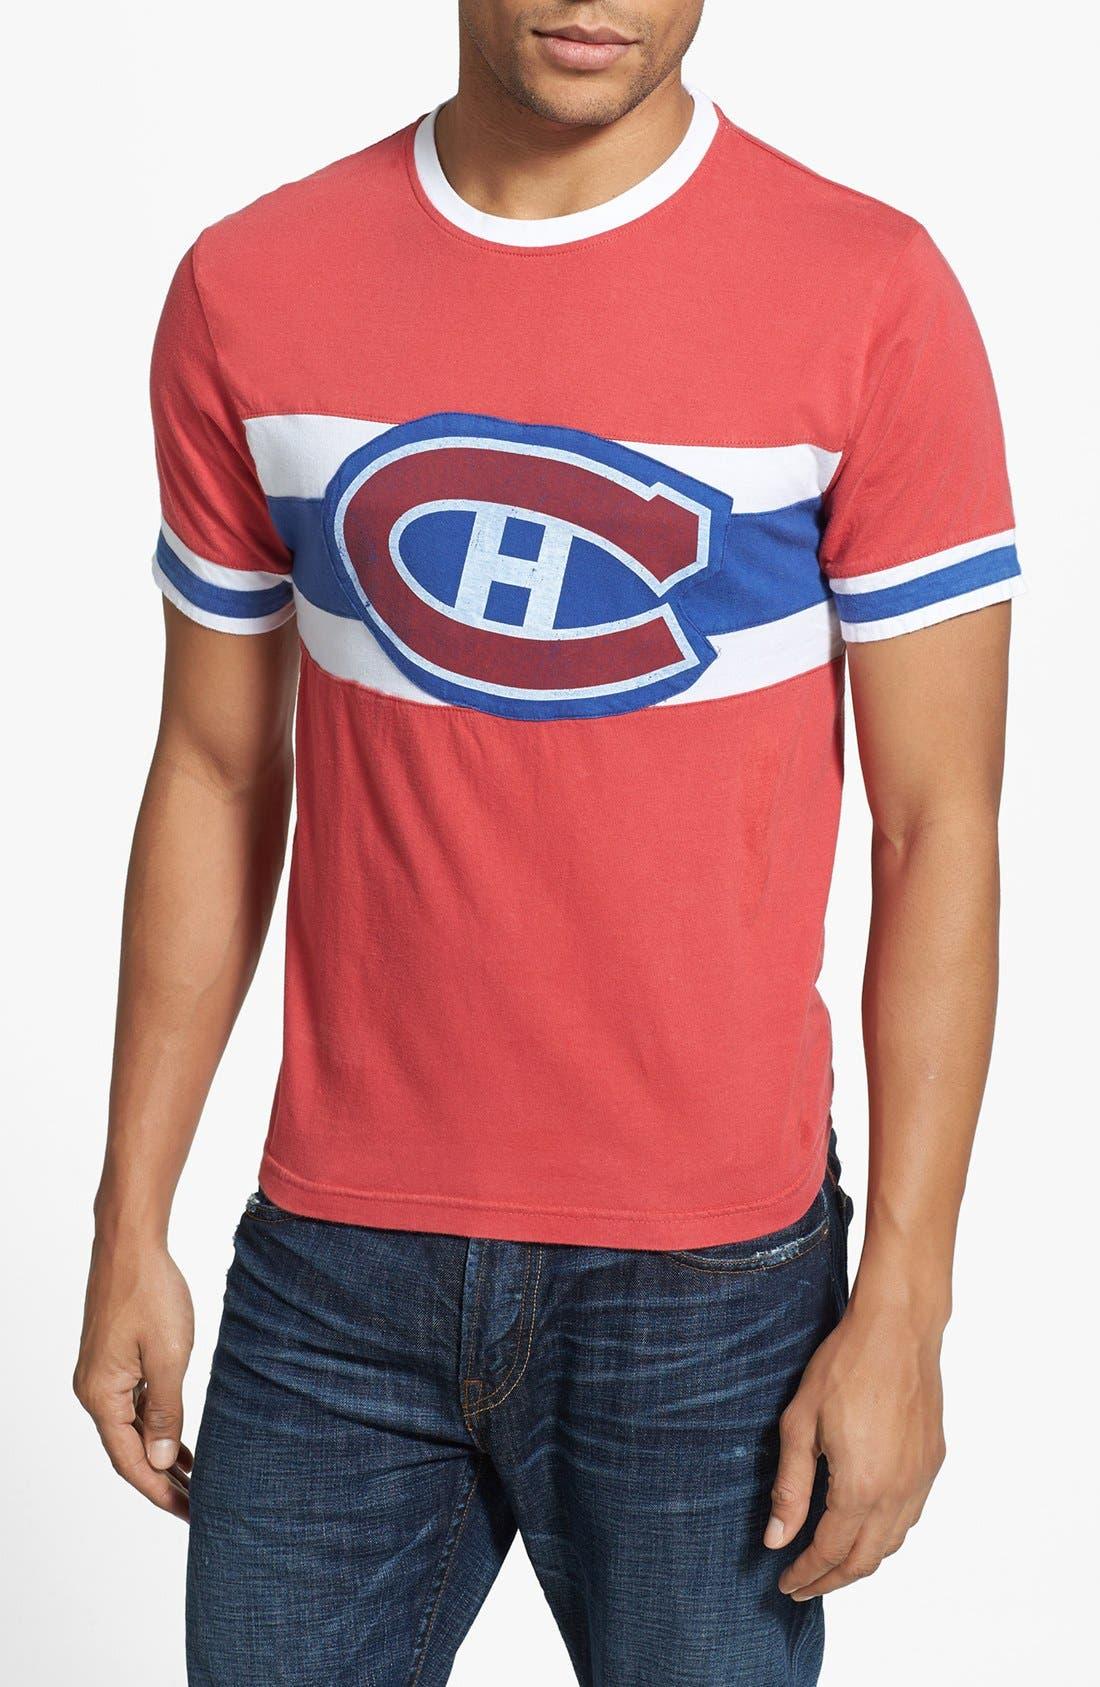 Alternate Image 1 Selected - Red Jacket 'Canadians' T-Shirt (Men)